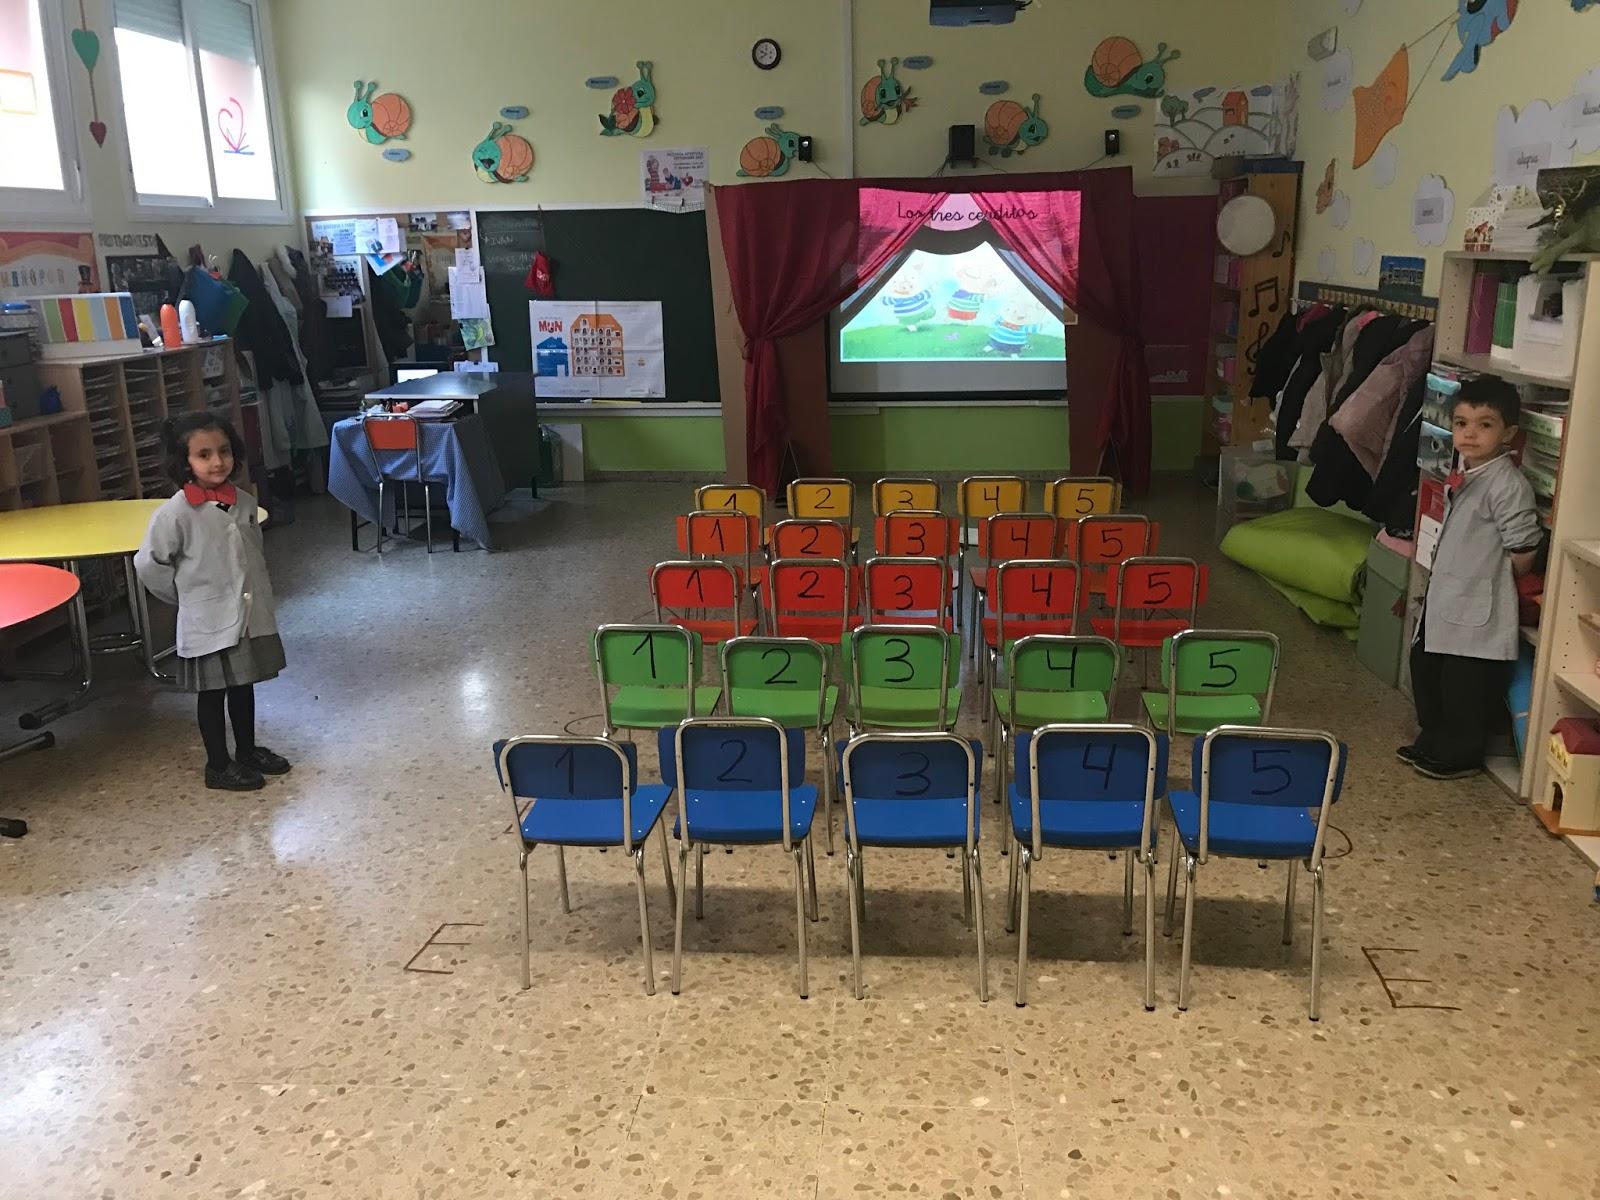 Agustinas Valladolid - 2017 - Infantil 4 - Teatro 4